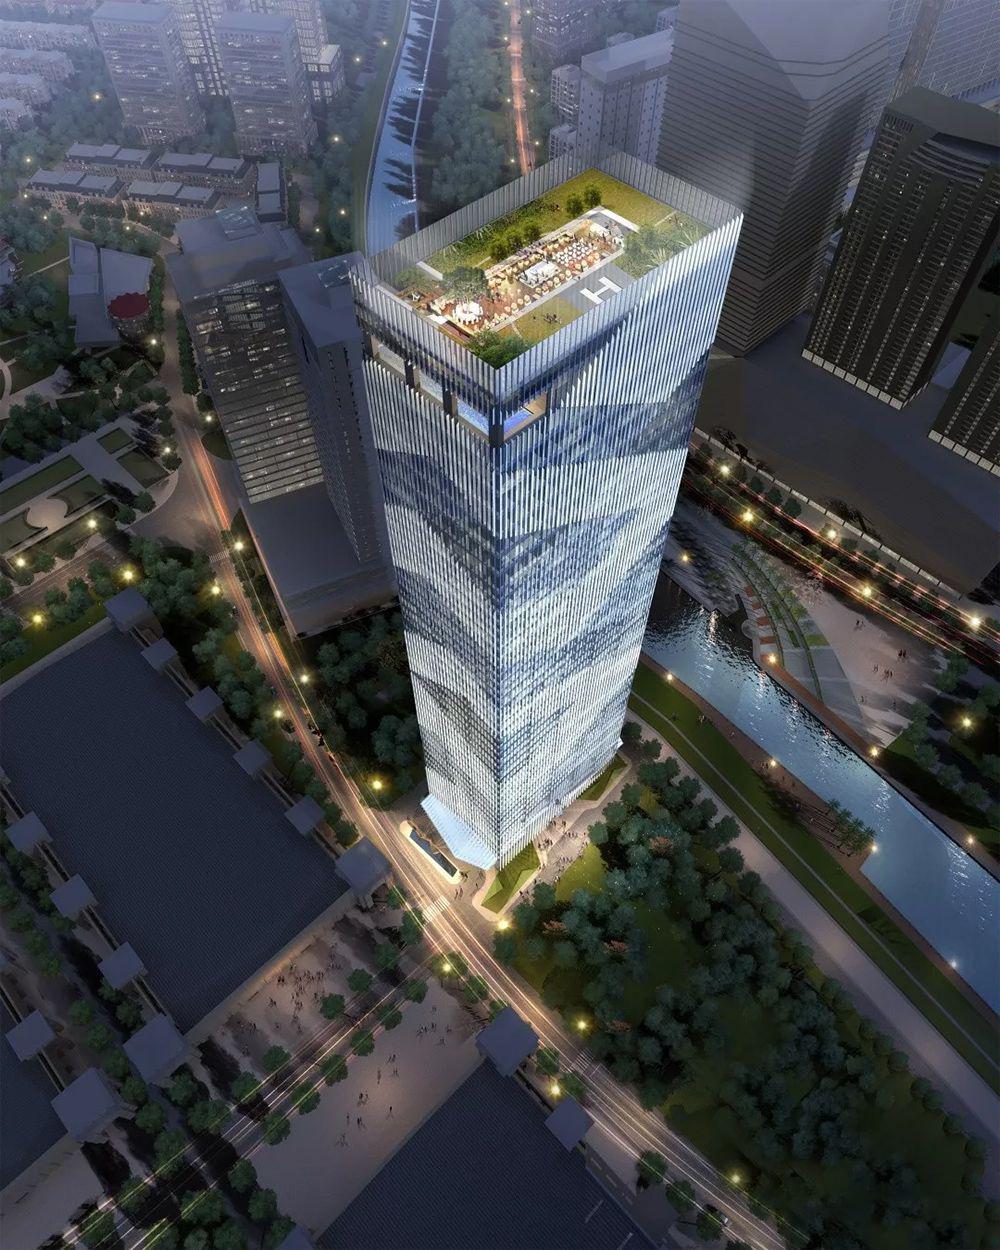 http://yuefangwangimg.oss-cn-hangzhou.aliyuncs.com/uploads/20191113/d23ea31307f08572f0b7c75ddeba7255Max.jpg